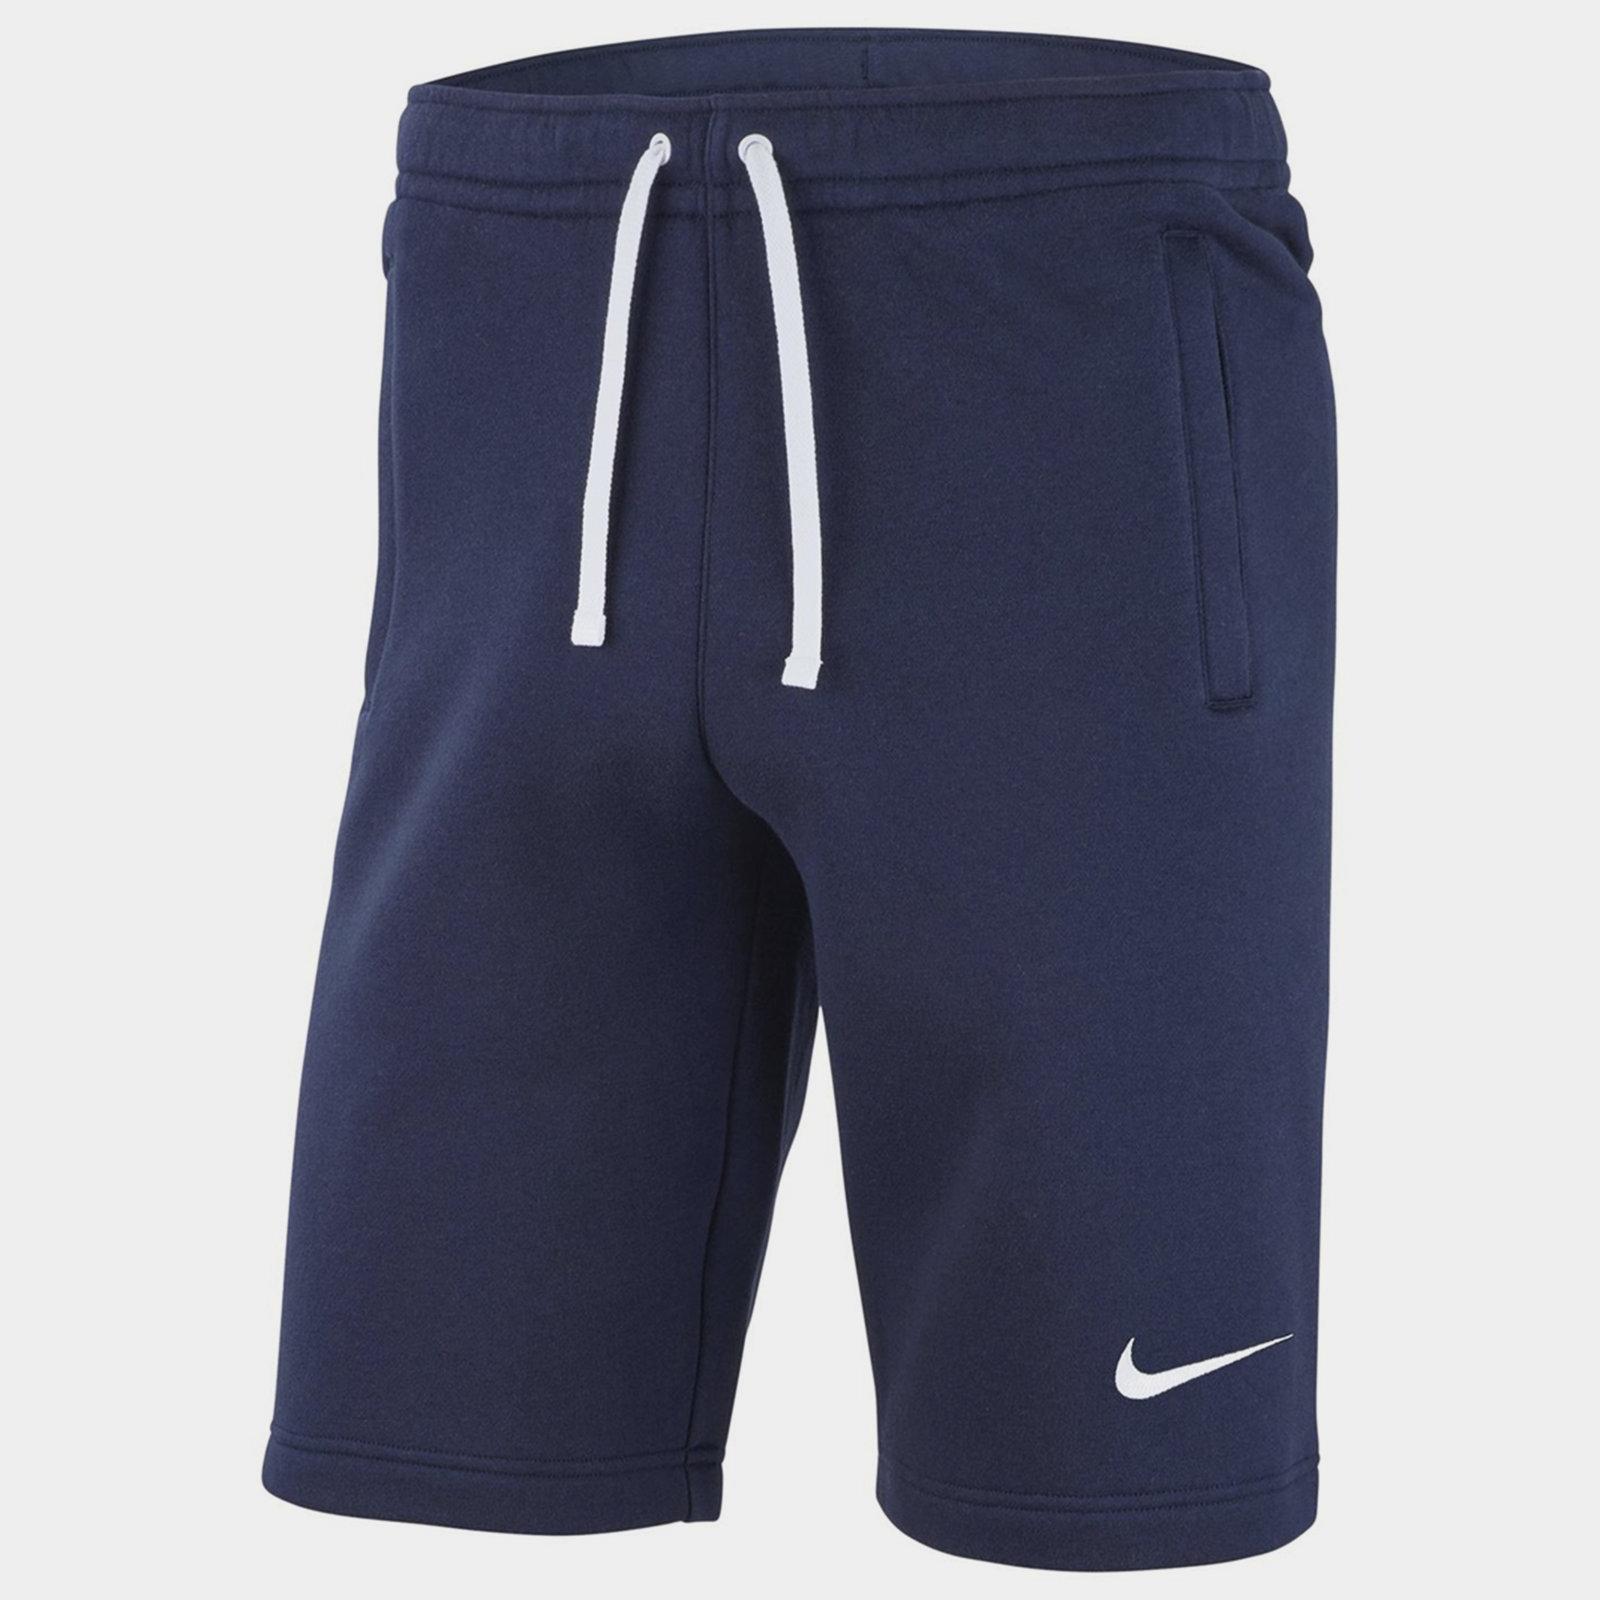 Flc Shorts